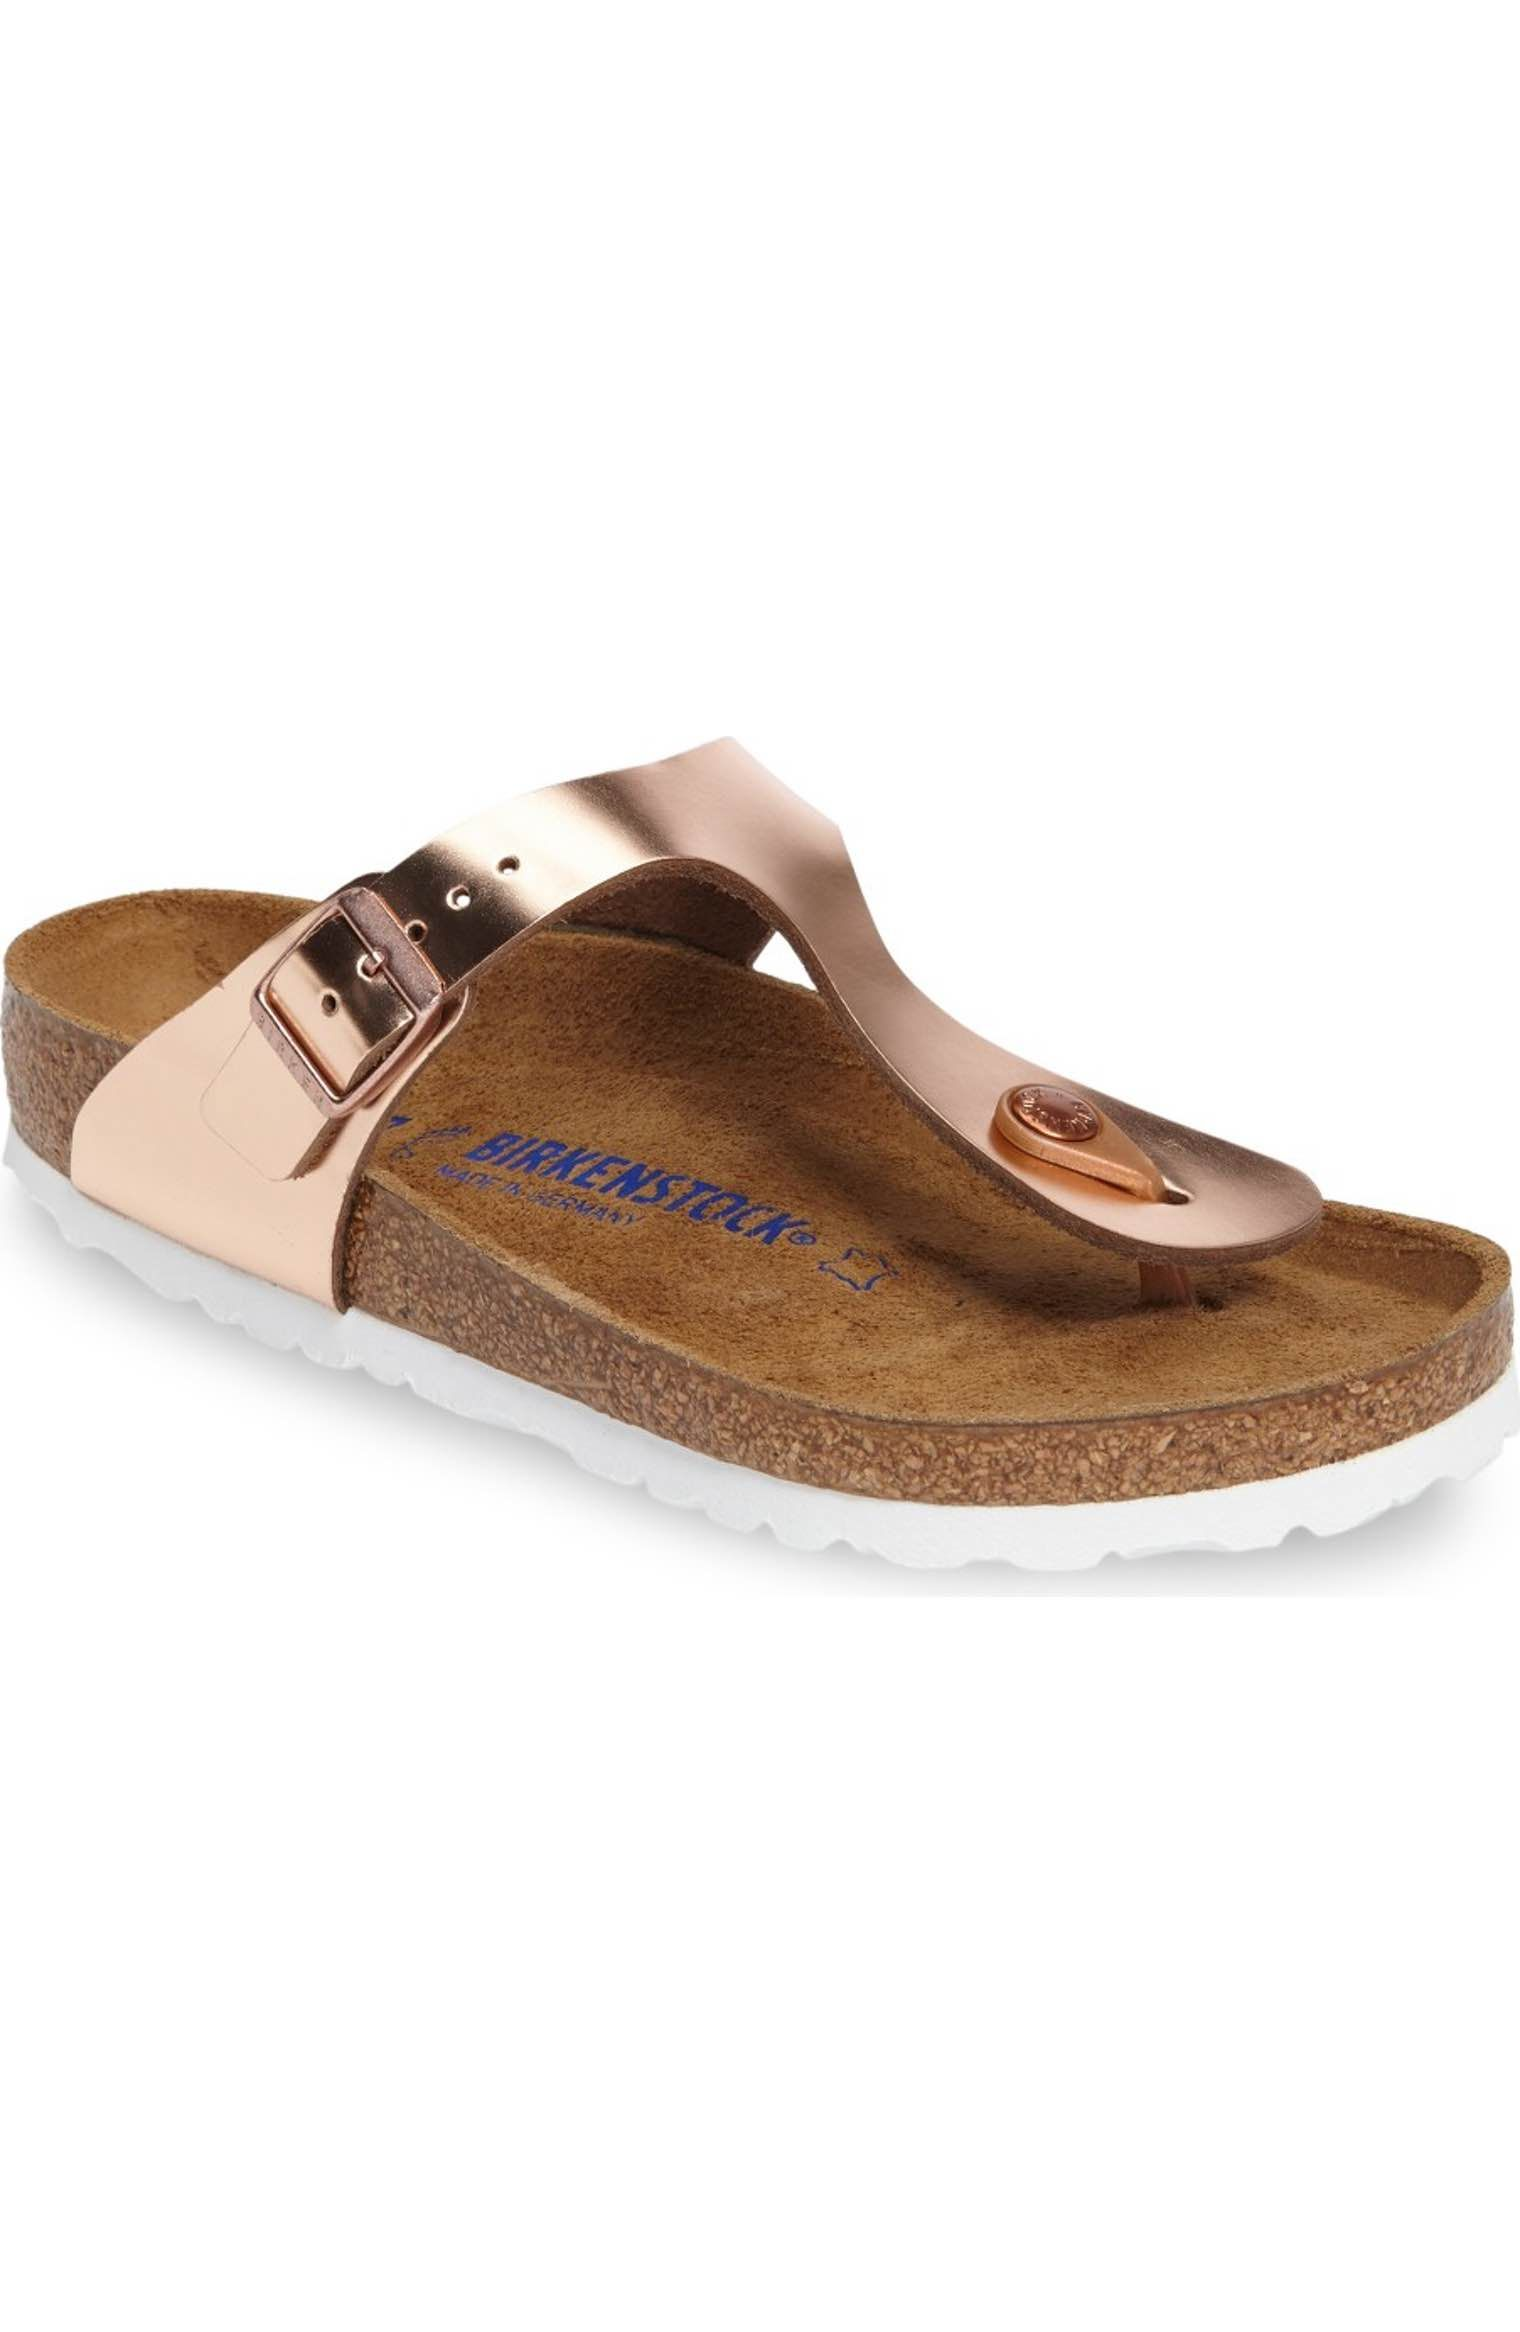 f5e3a322624e Main Image - Birkenstock Gizeh Soft Footbed Flip Flop (Women ...